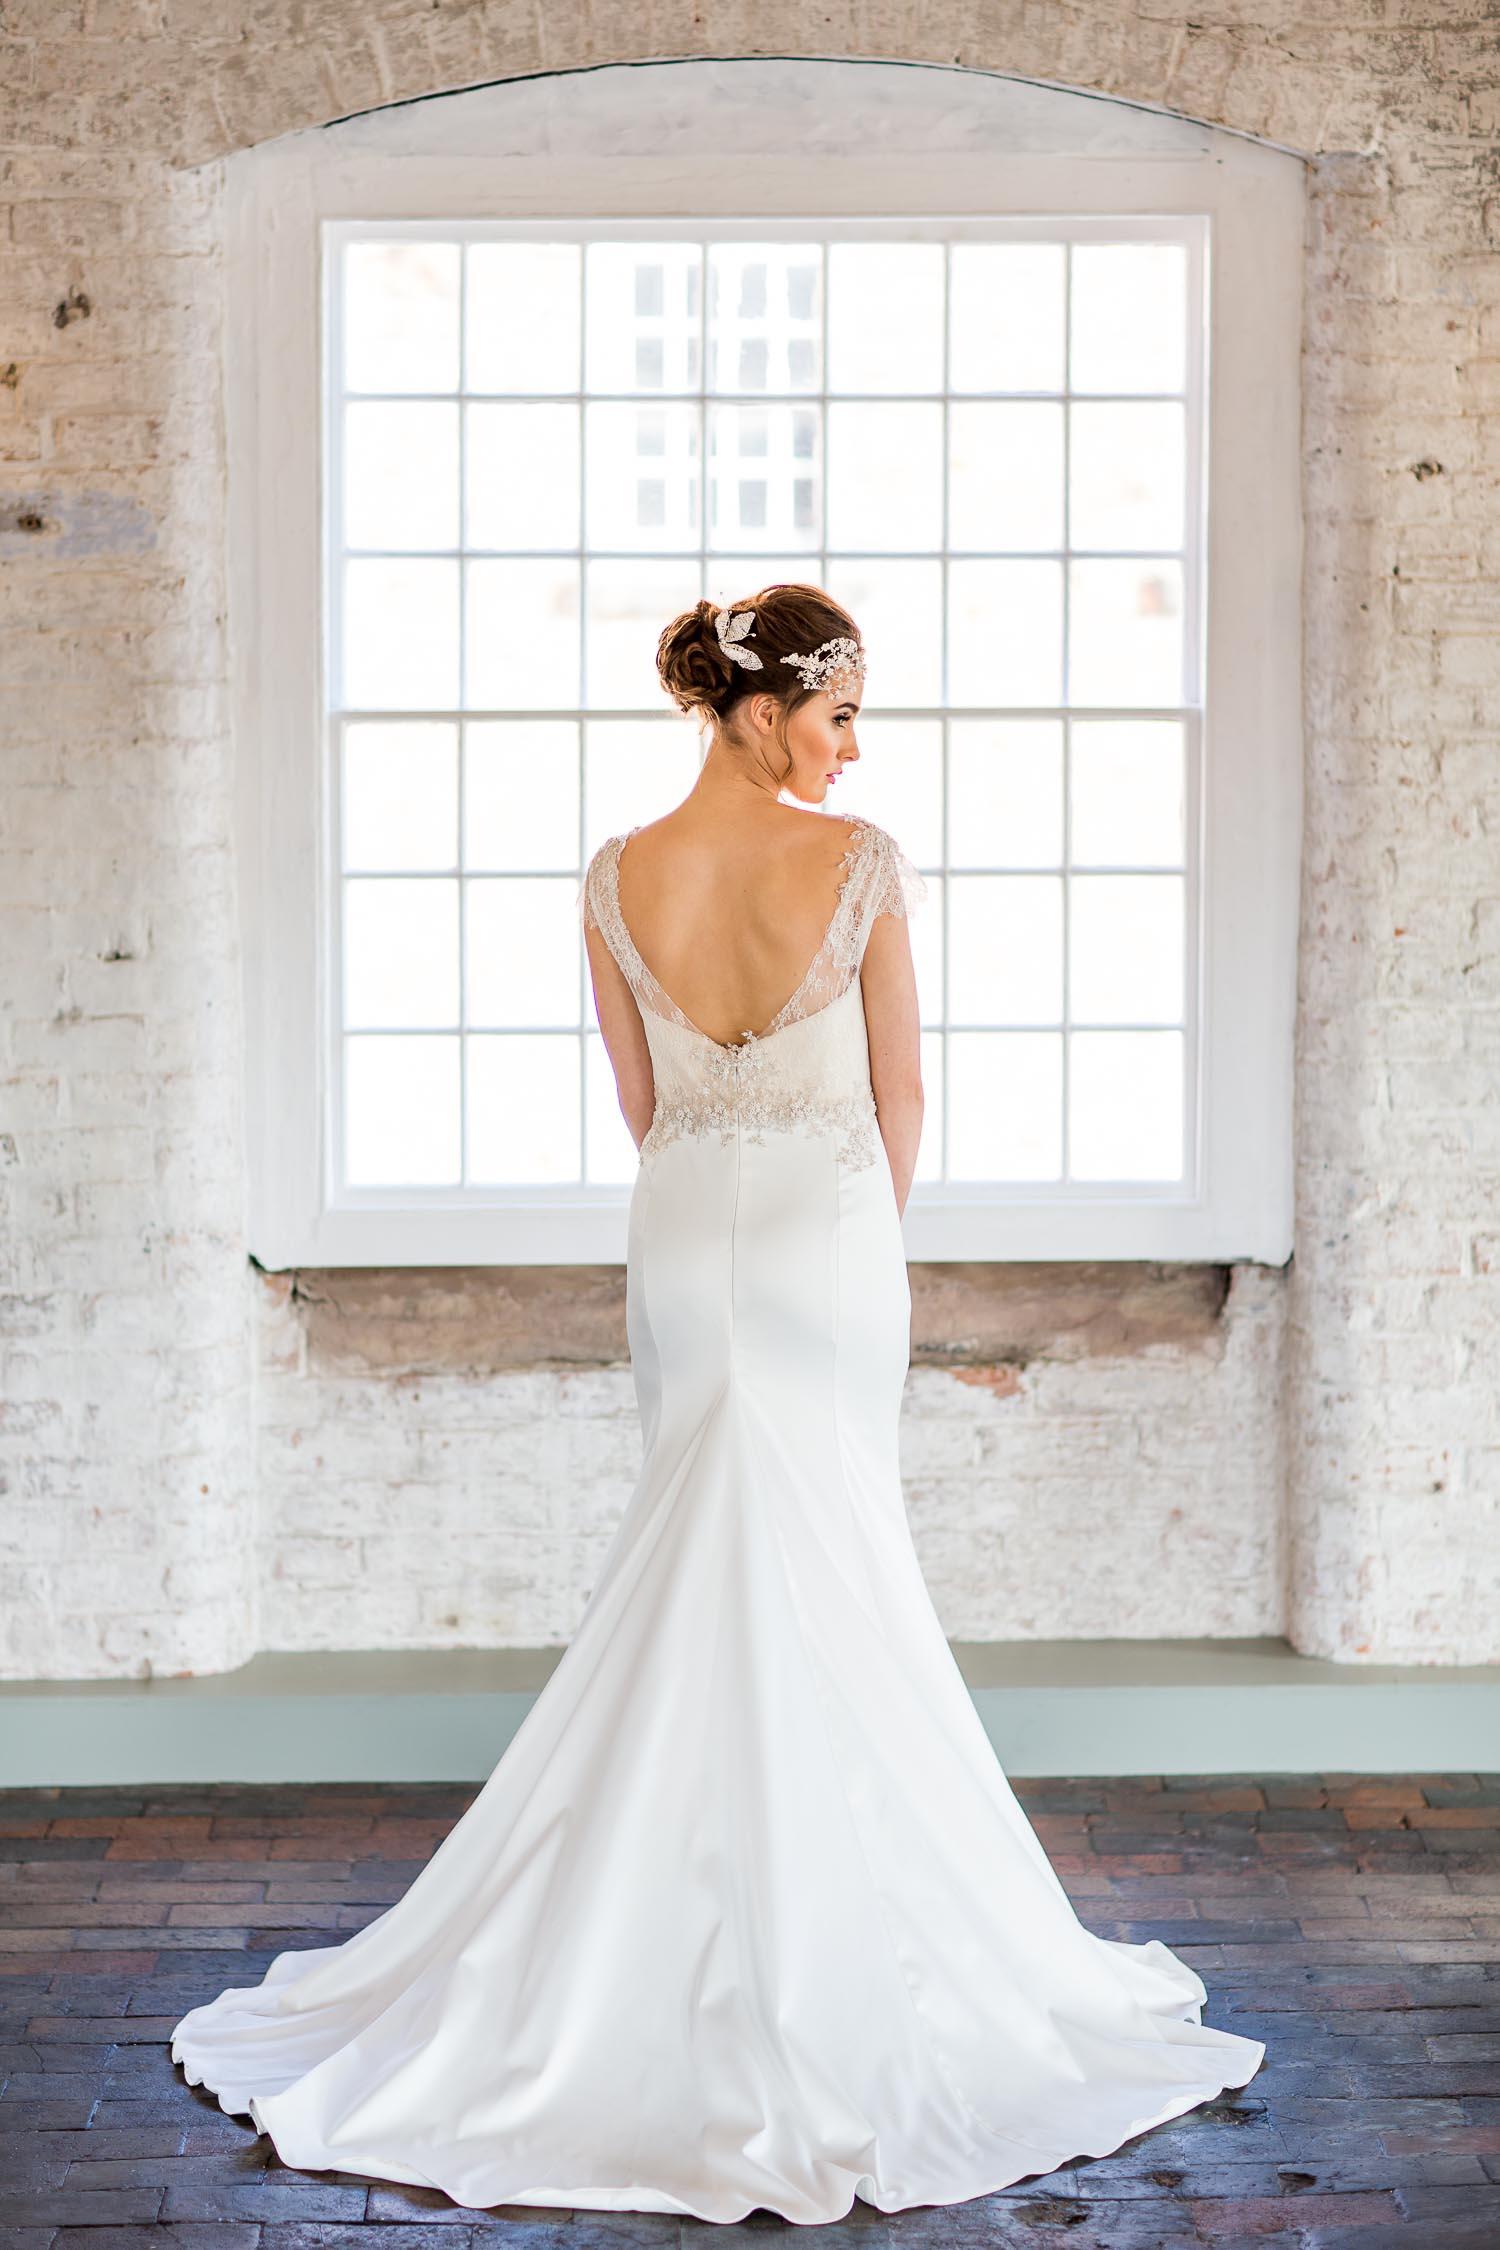 Timeless Couture Haarlem Bridal Derbyshire Wedding Collection West Mill Derbyshire